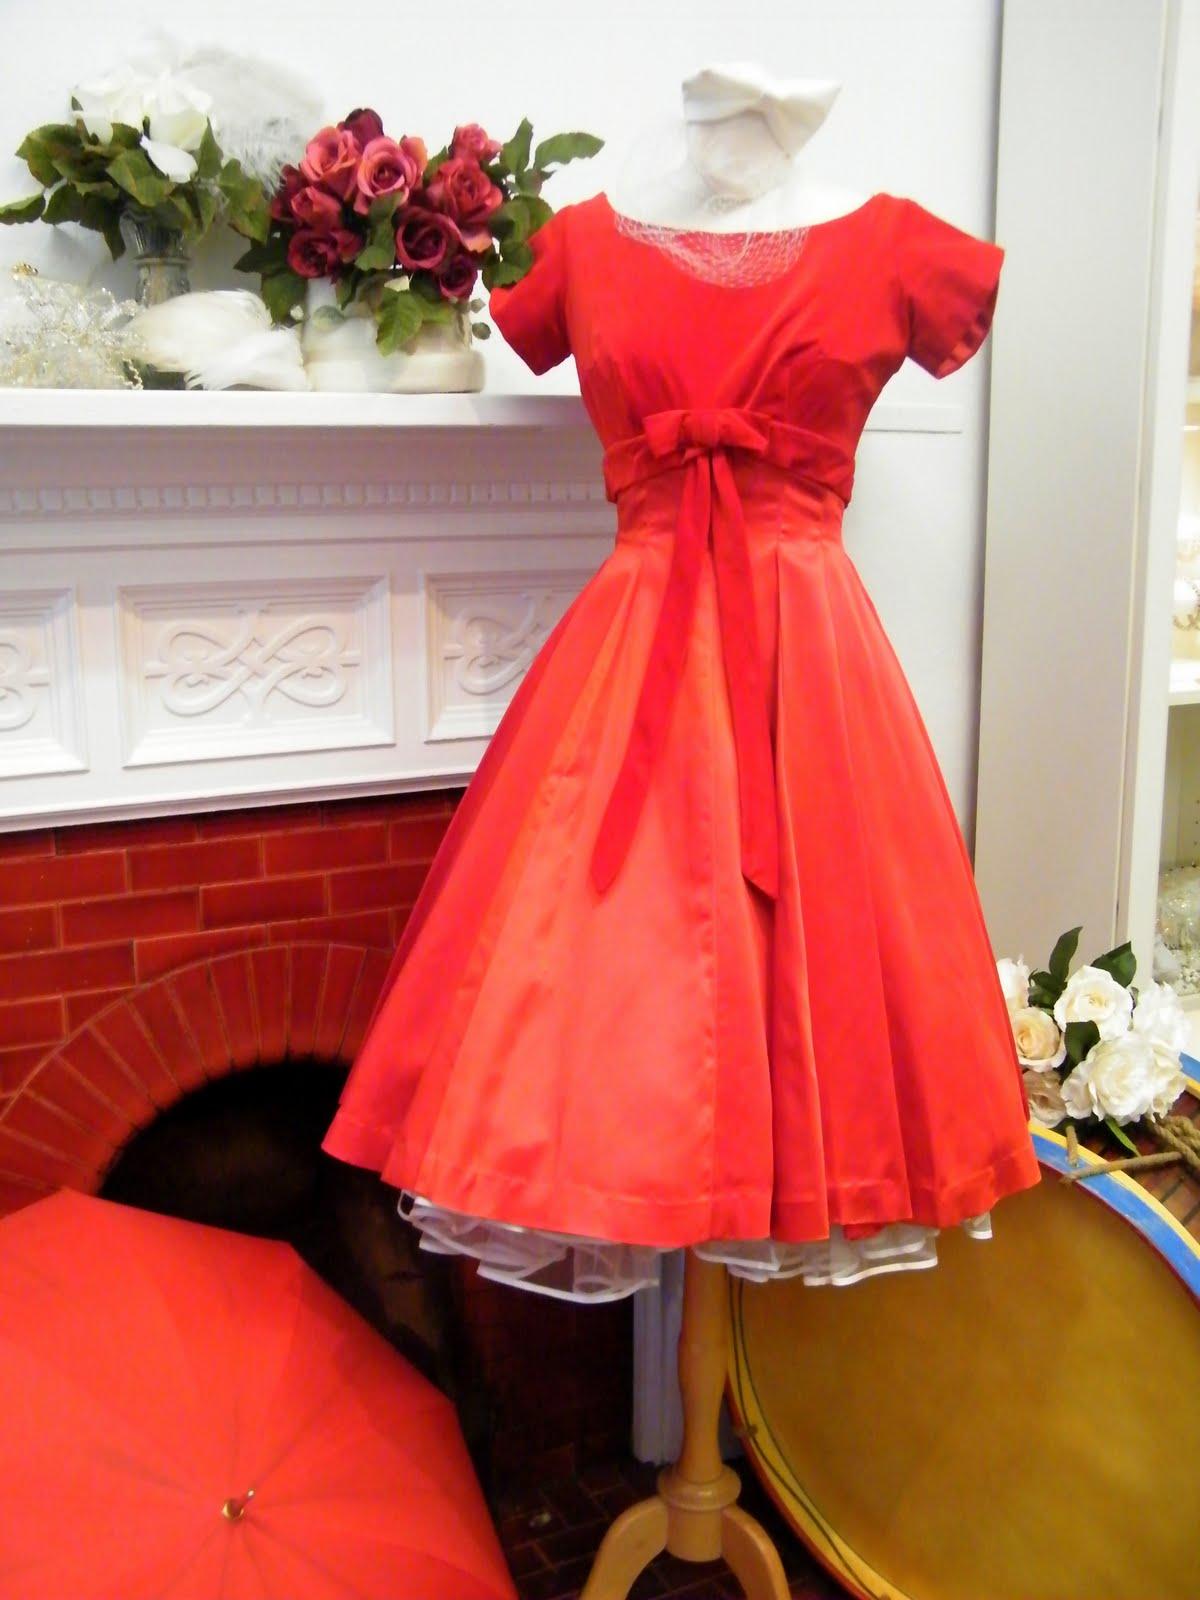 1950 s wedding style dresses